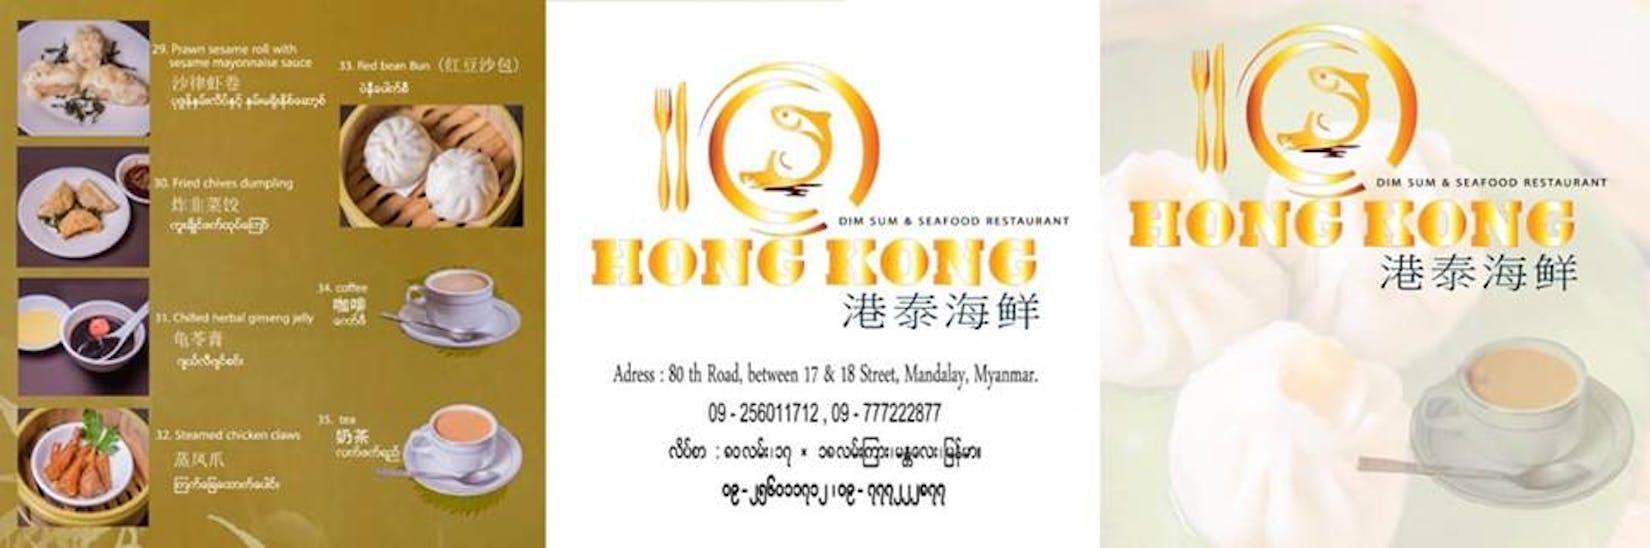 Hong Kong Sea Food(港泰海鲜酒家) | yathar